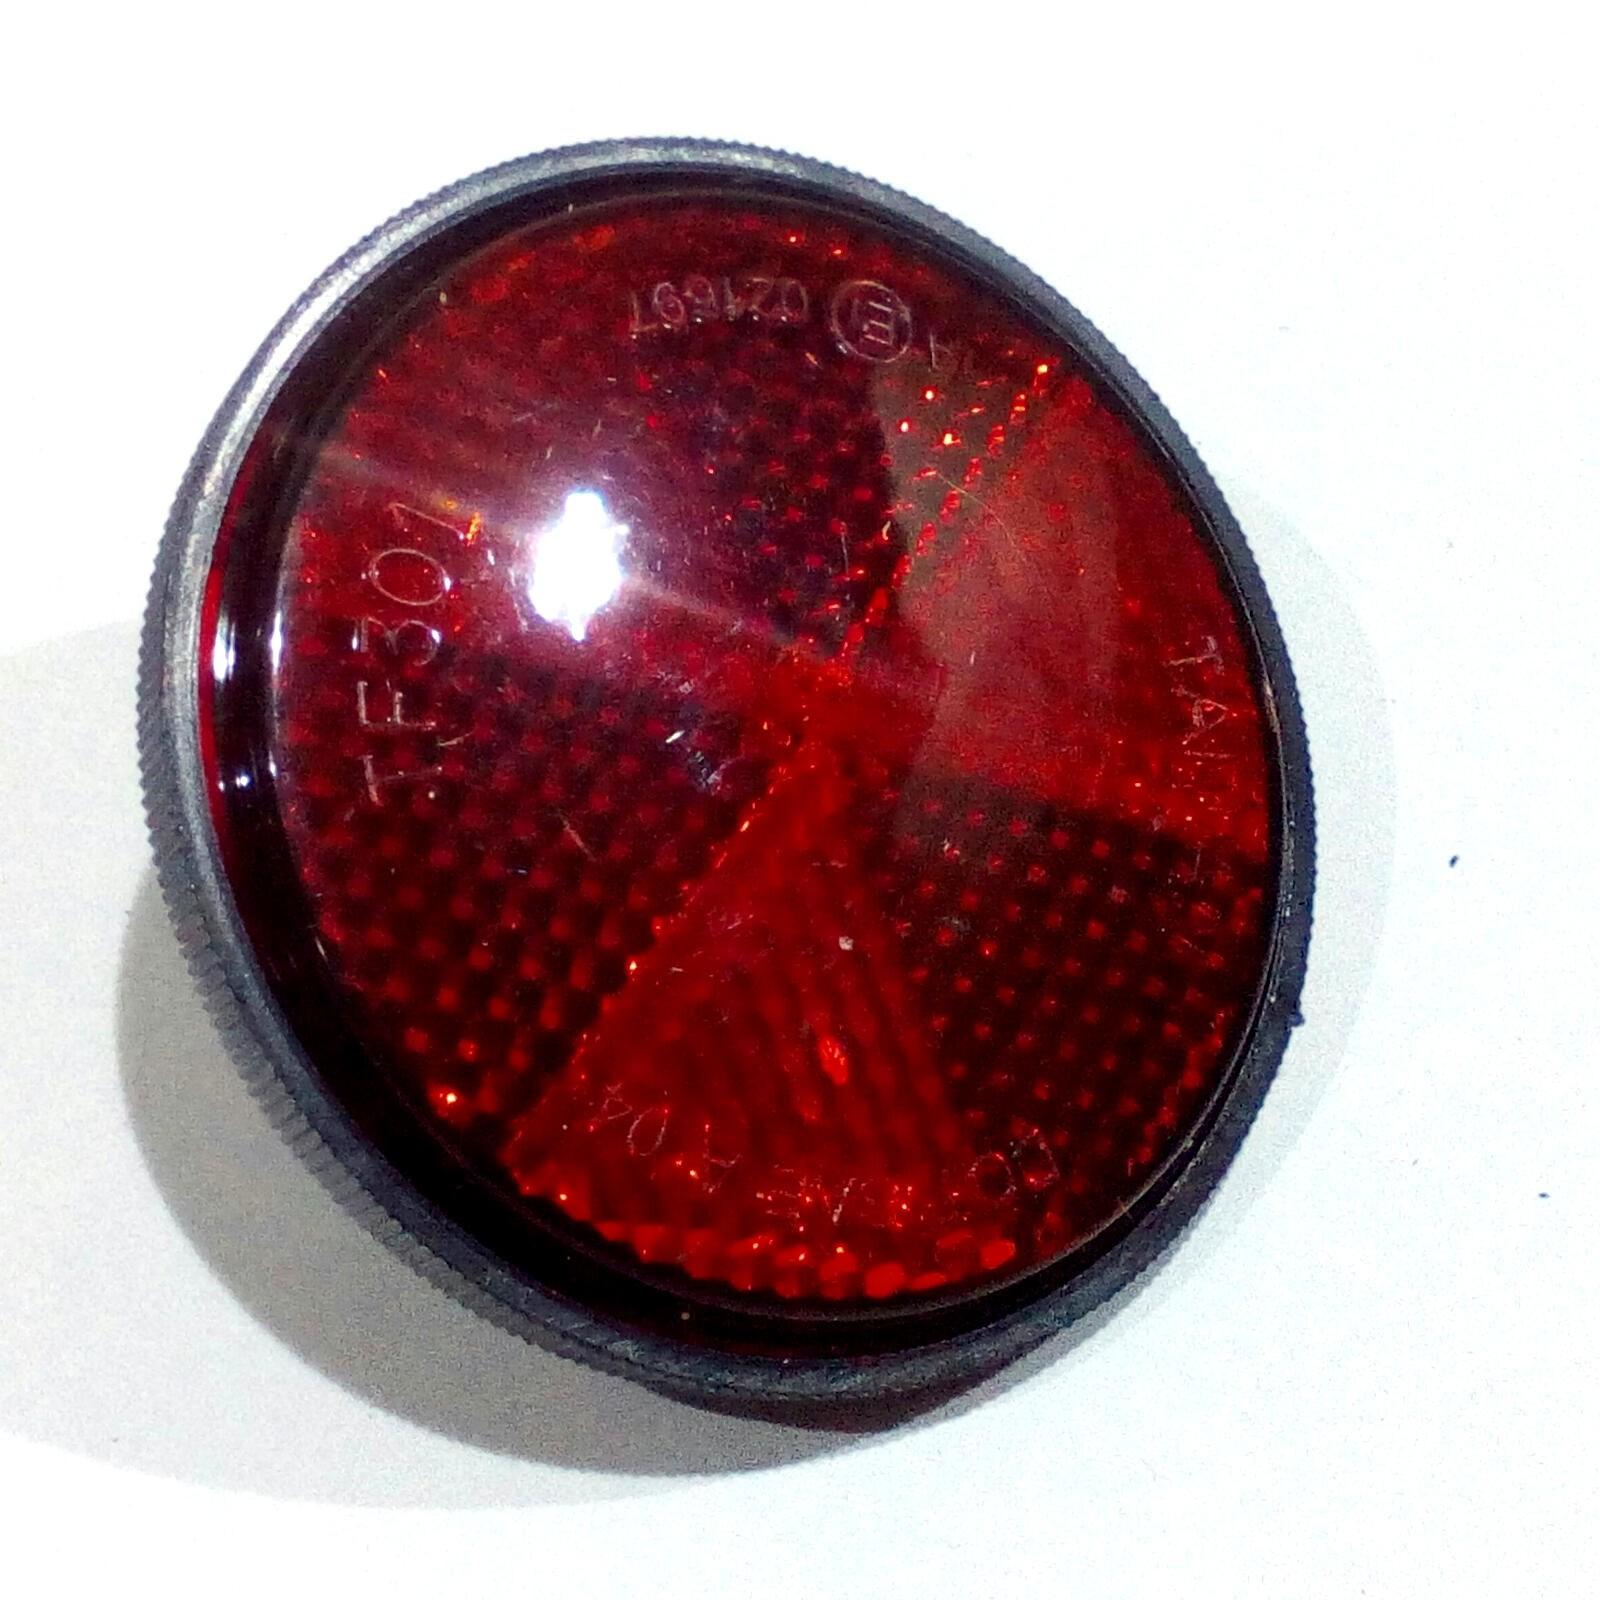 1x Fahrrad Reflektor schraube ROT RÜCKSTRAHLER SCHUTZBLECH 60MM Durchmesser